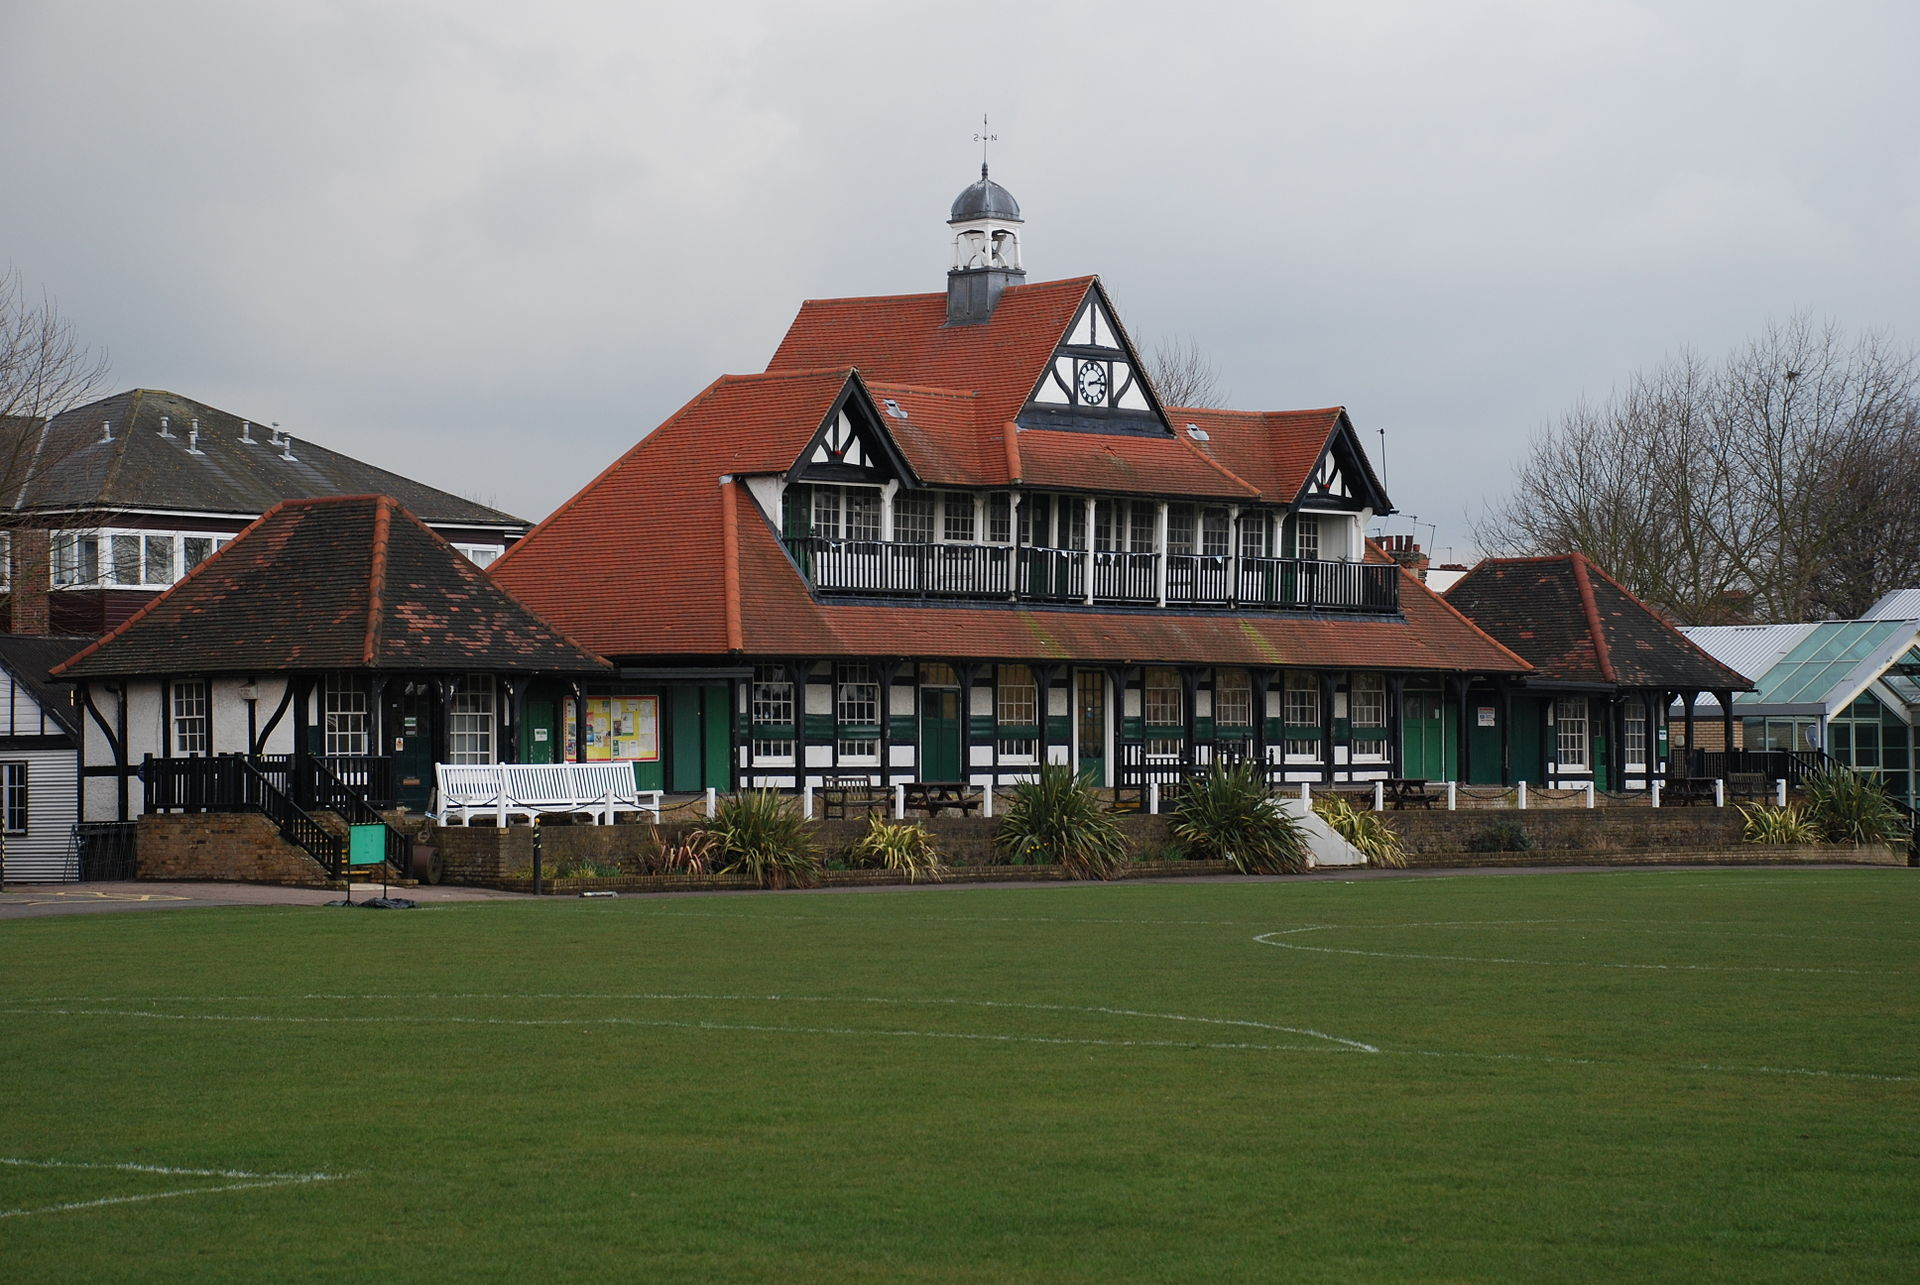 Leyton Cricket Pavilion loses bid to become a food hub